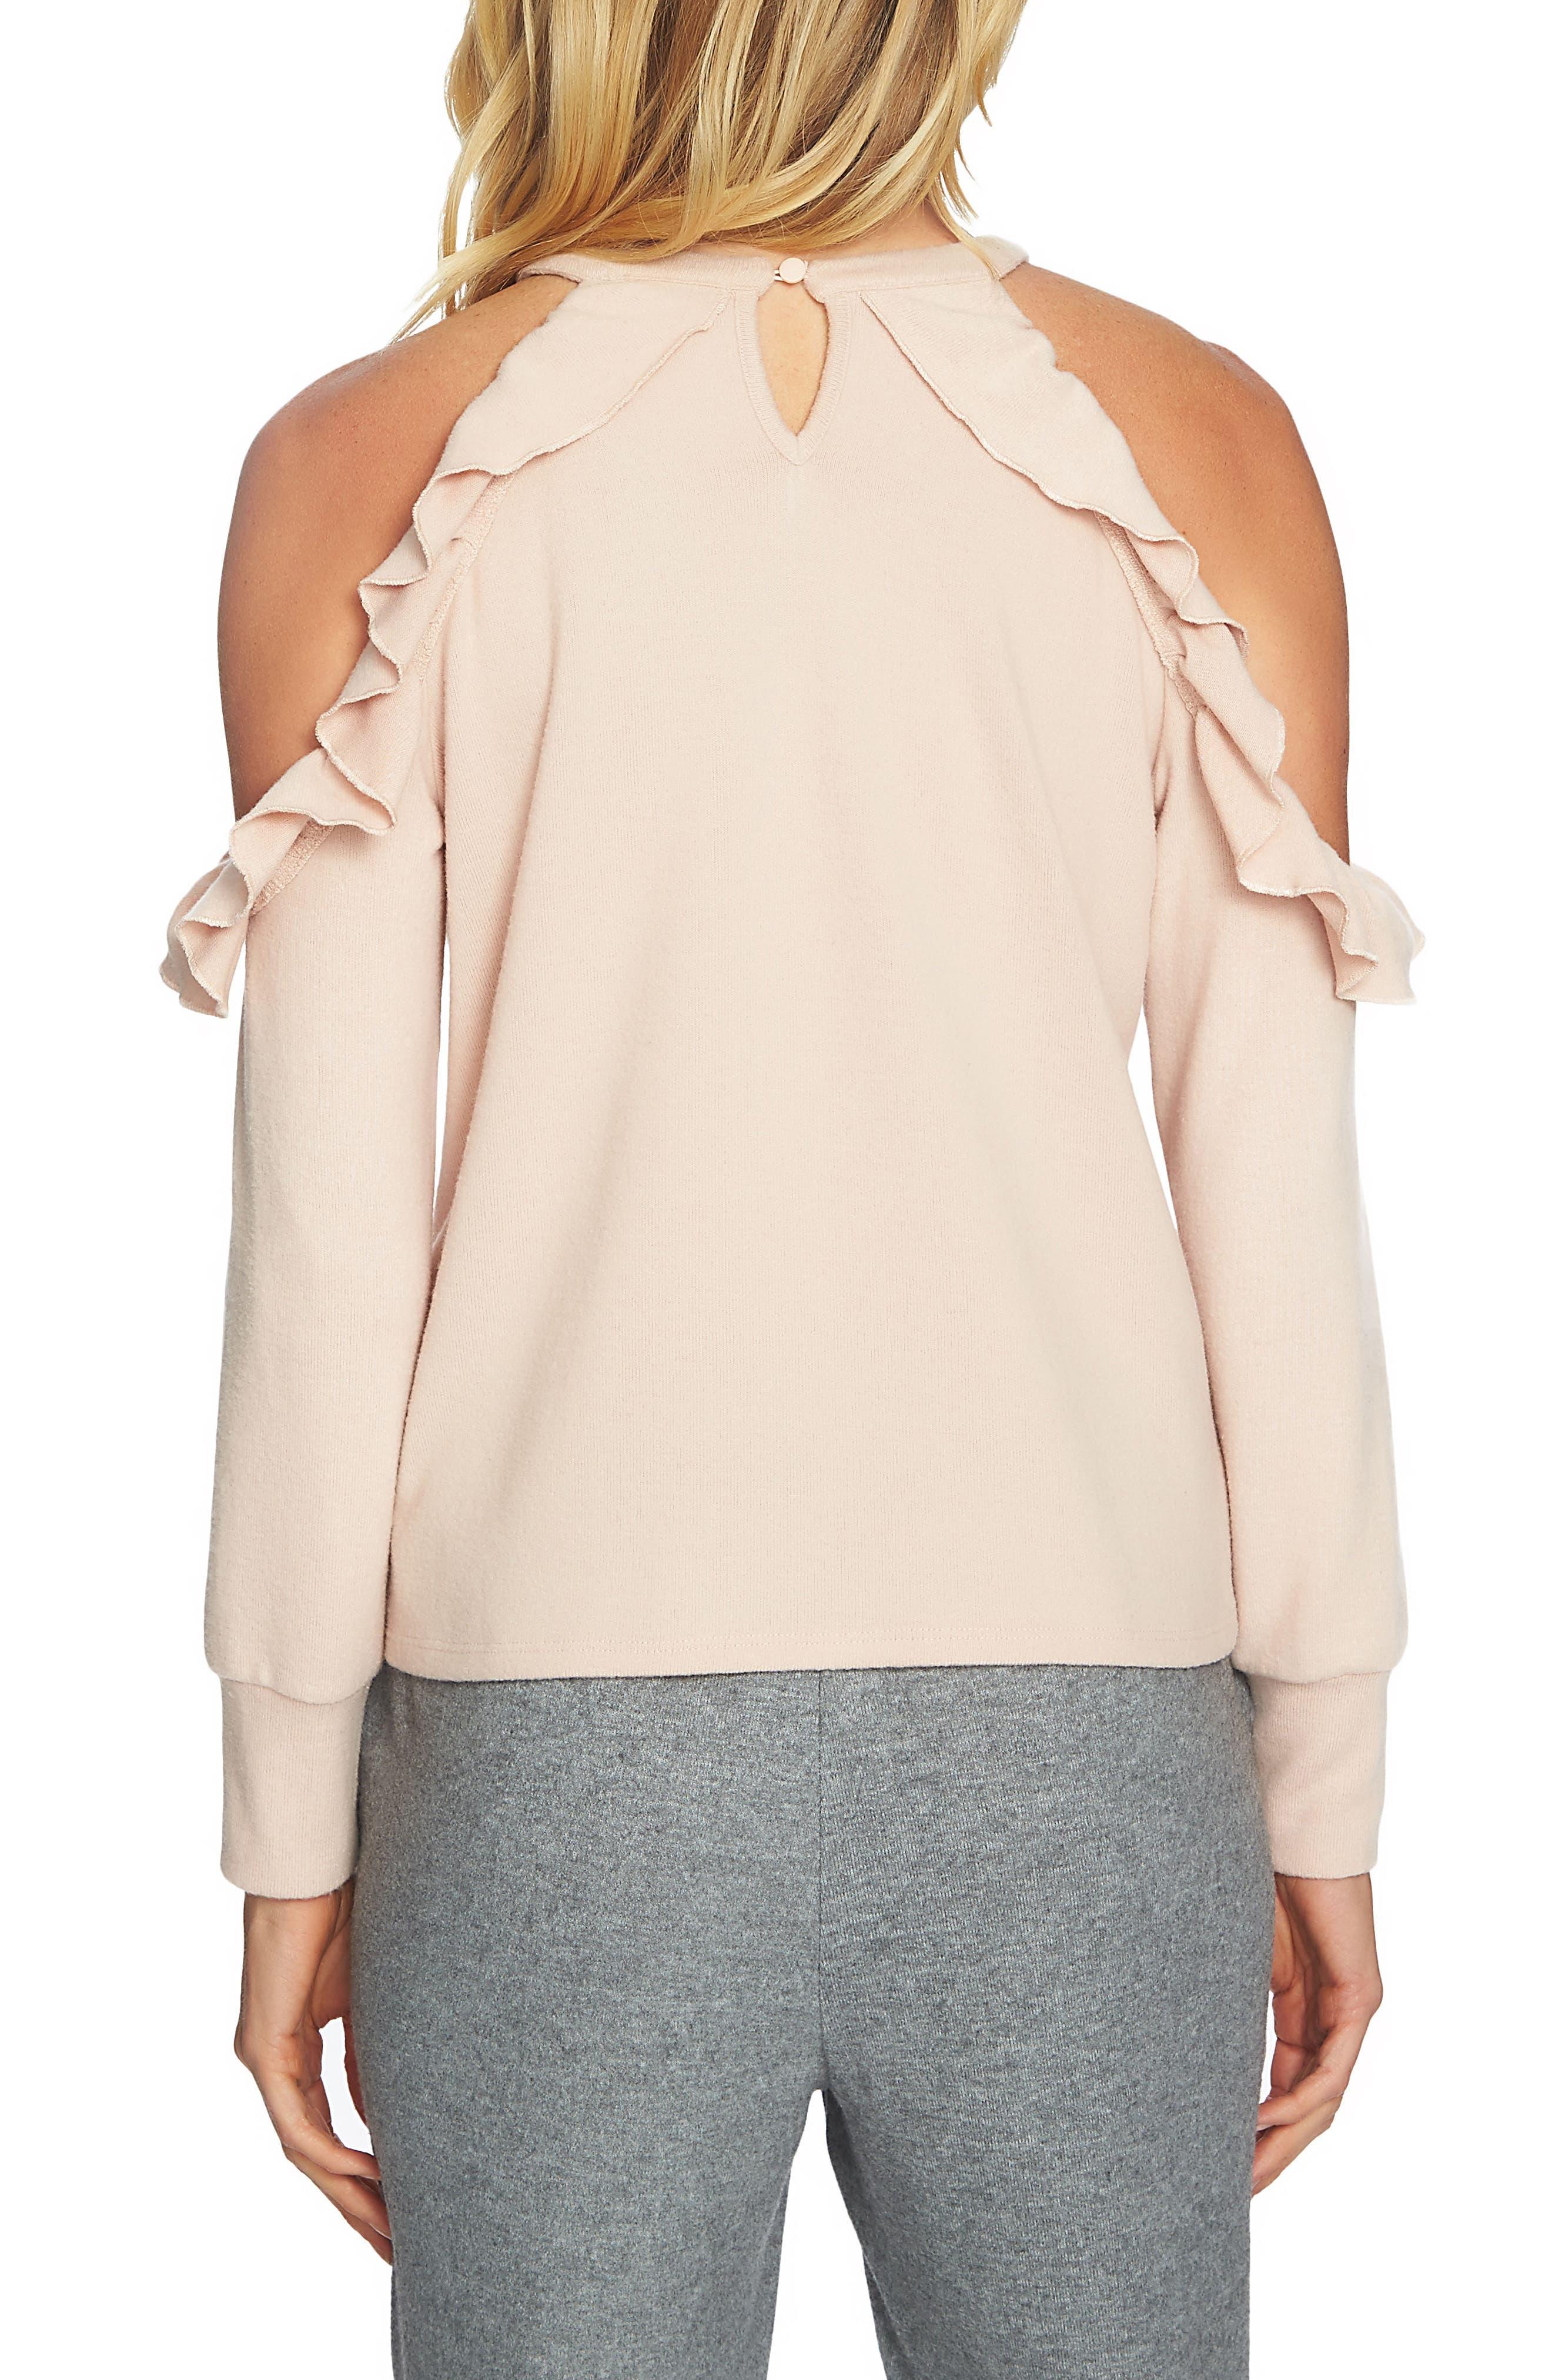 The Cozy Cold Shoulder Knit Top,                             Alternate thumbnail 2, color,                             897-Blush Frost